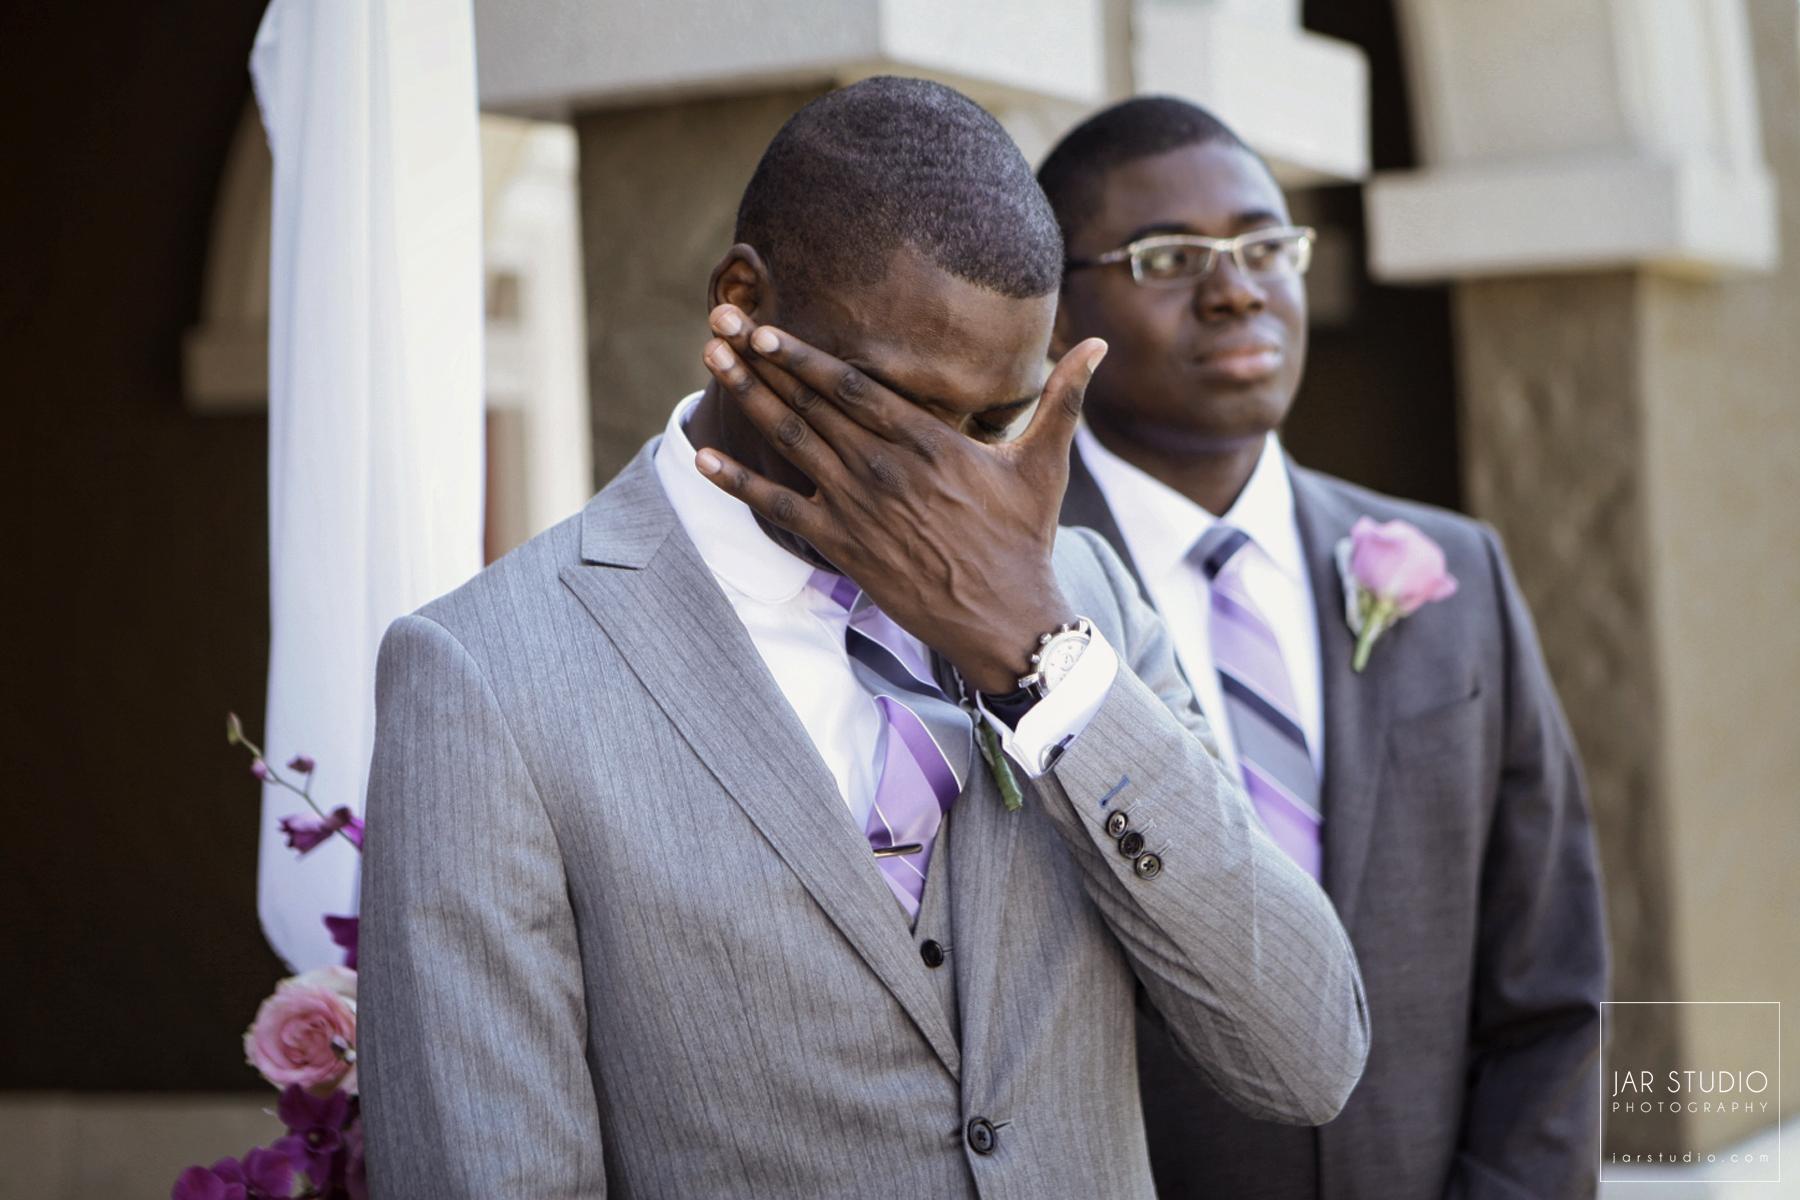 12-groom-emotional-moment-seeing-bride-nigerian-wedding-jarstudio-photography.JPG